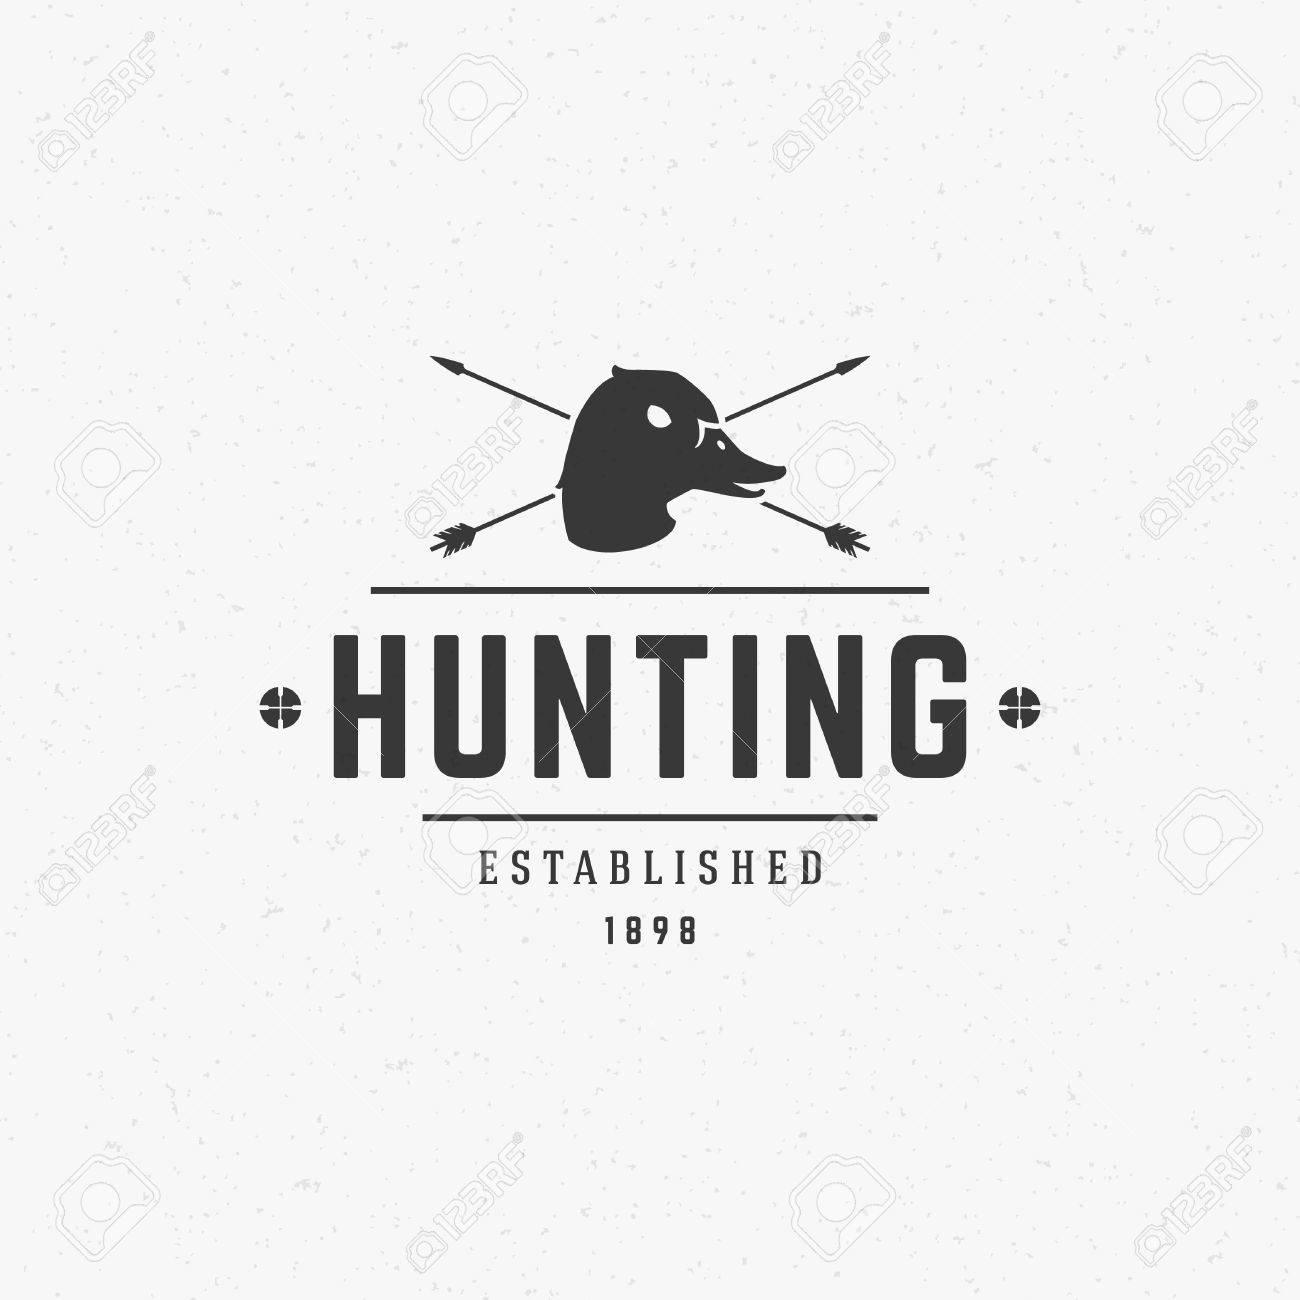 Hunting Club Vintage Template Emblem  Cross Hunting Arrows